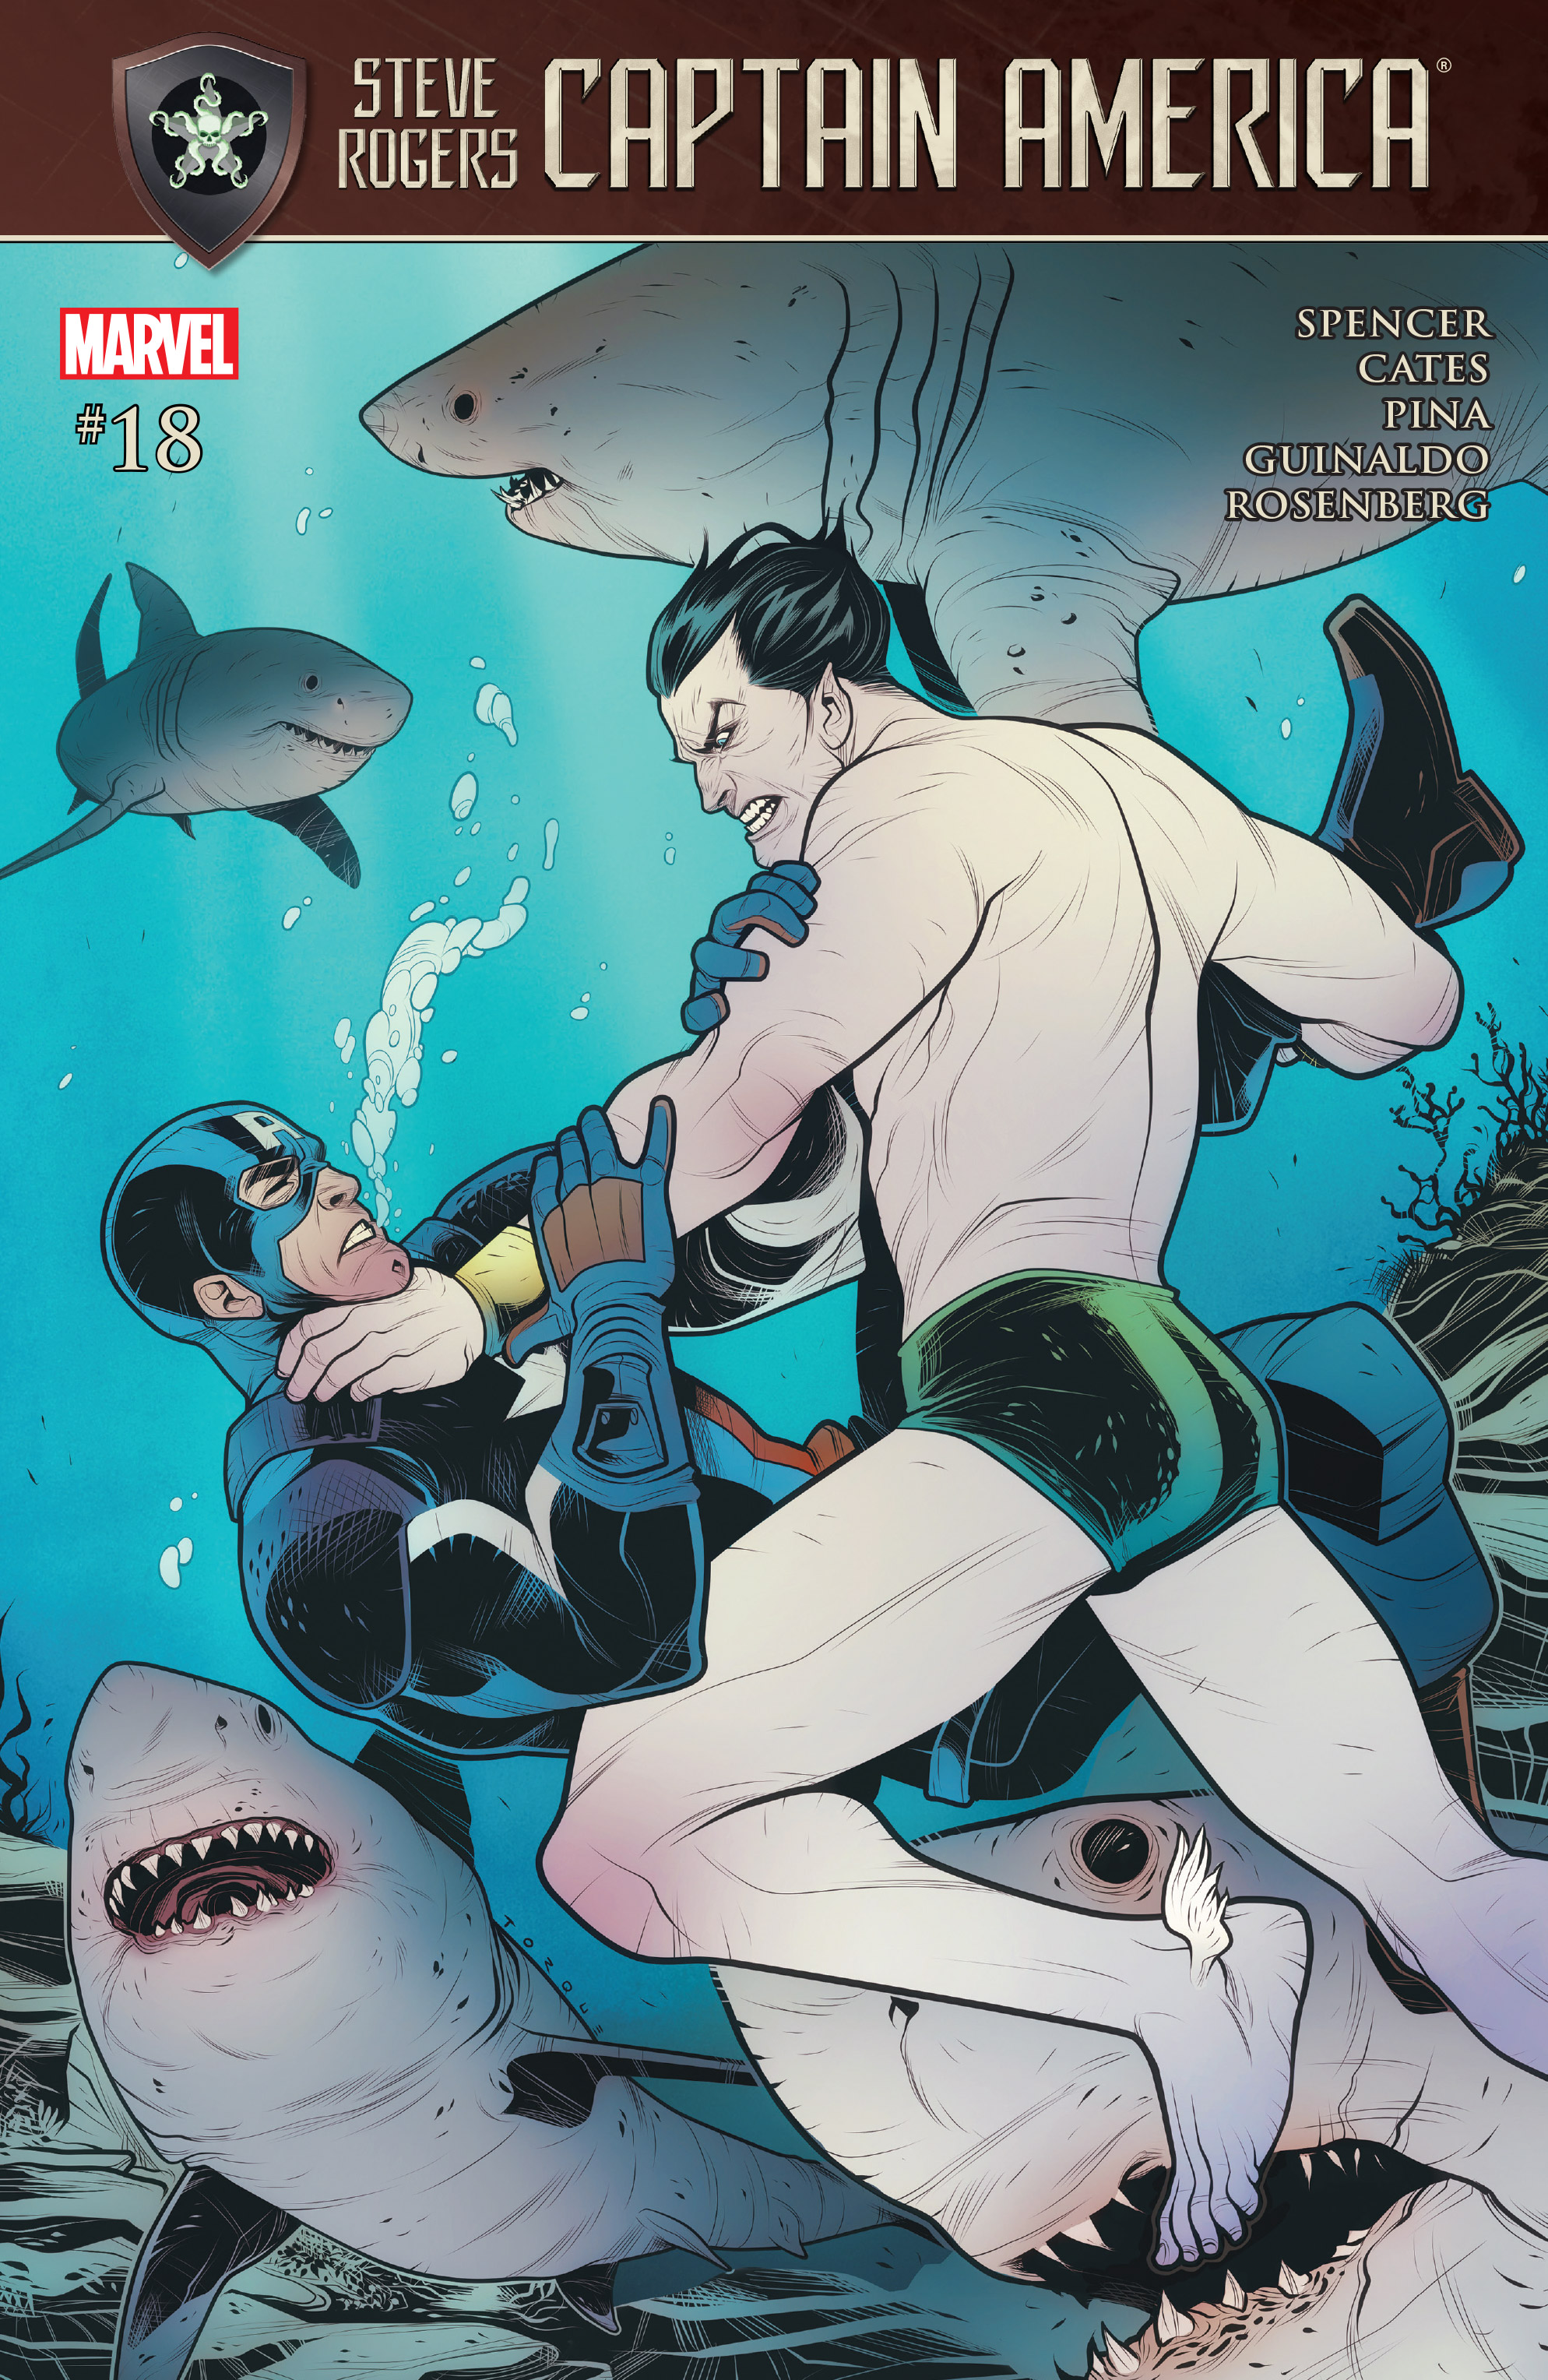 Read online Captain America: Steve Rogers comic -  Issue #18 - 1